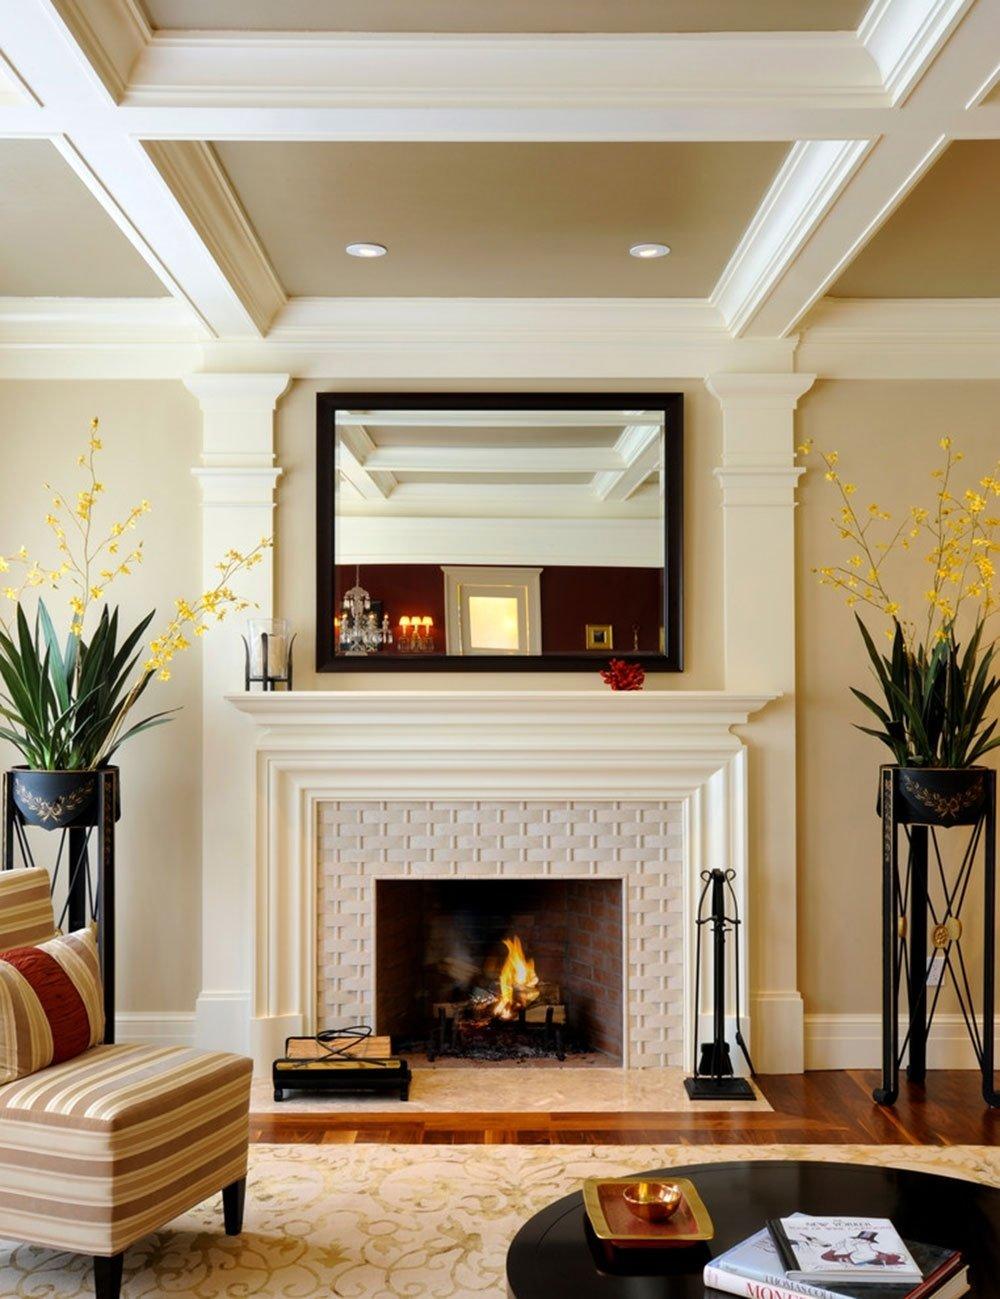 10 Unique Fireplace Design Ideas With Tile modern fireplace tile ideas 2021